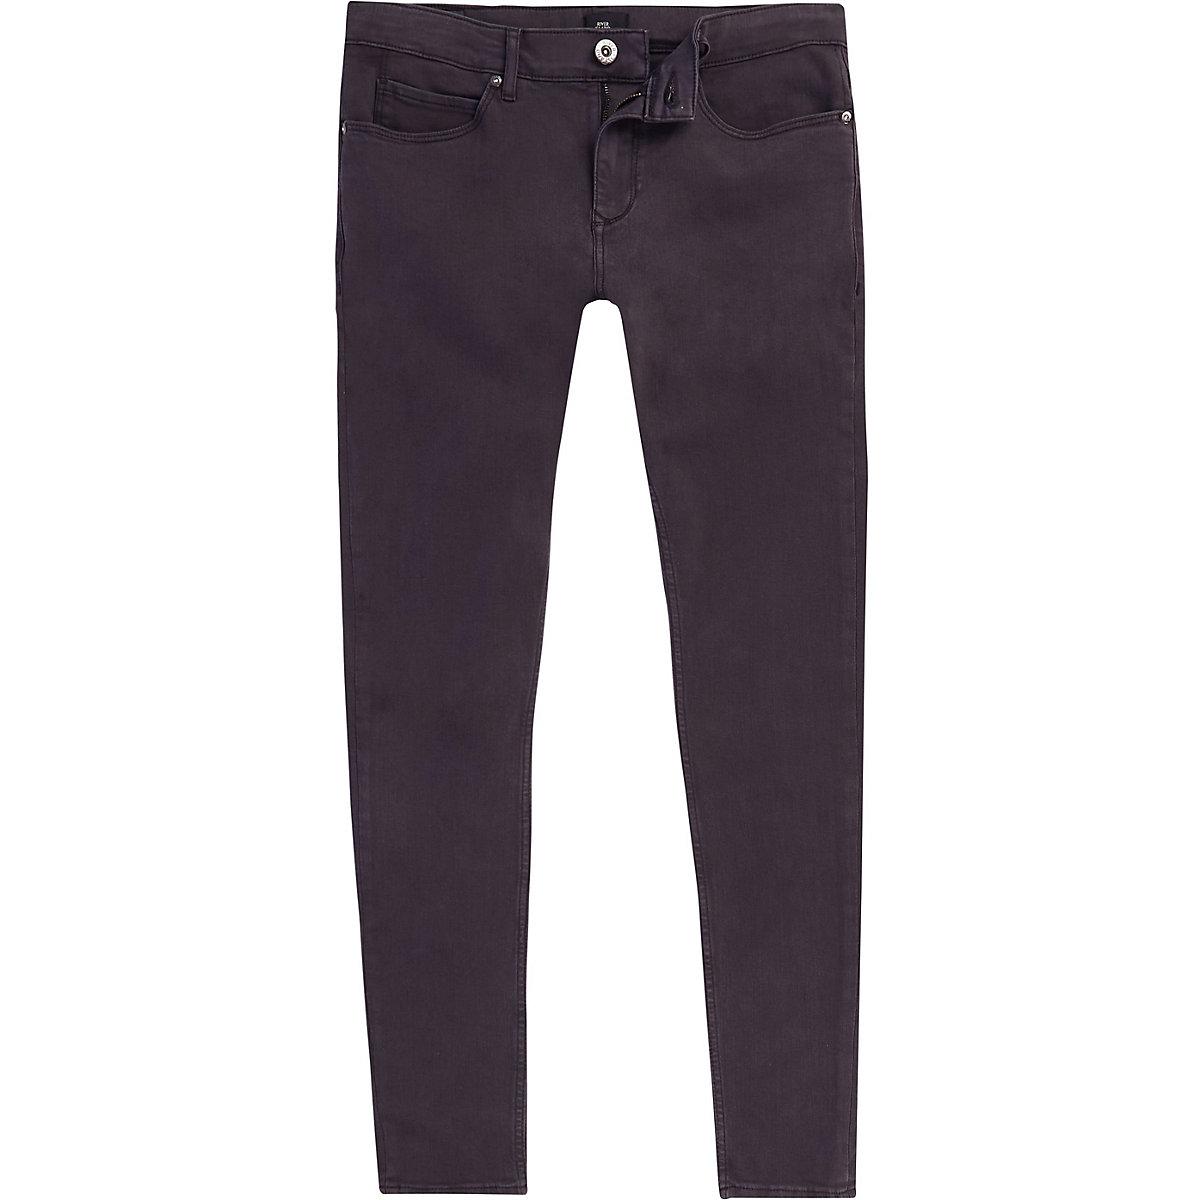 Grey Ollie super skinny spray on jeans